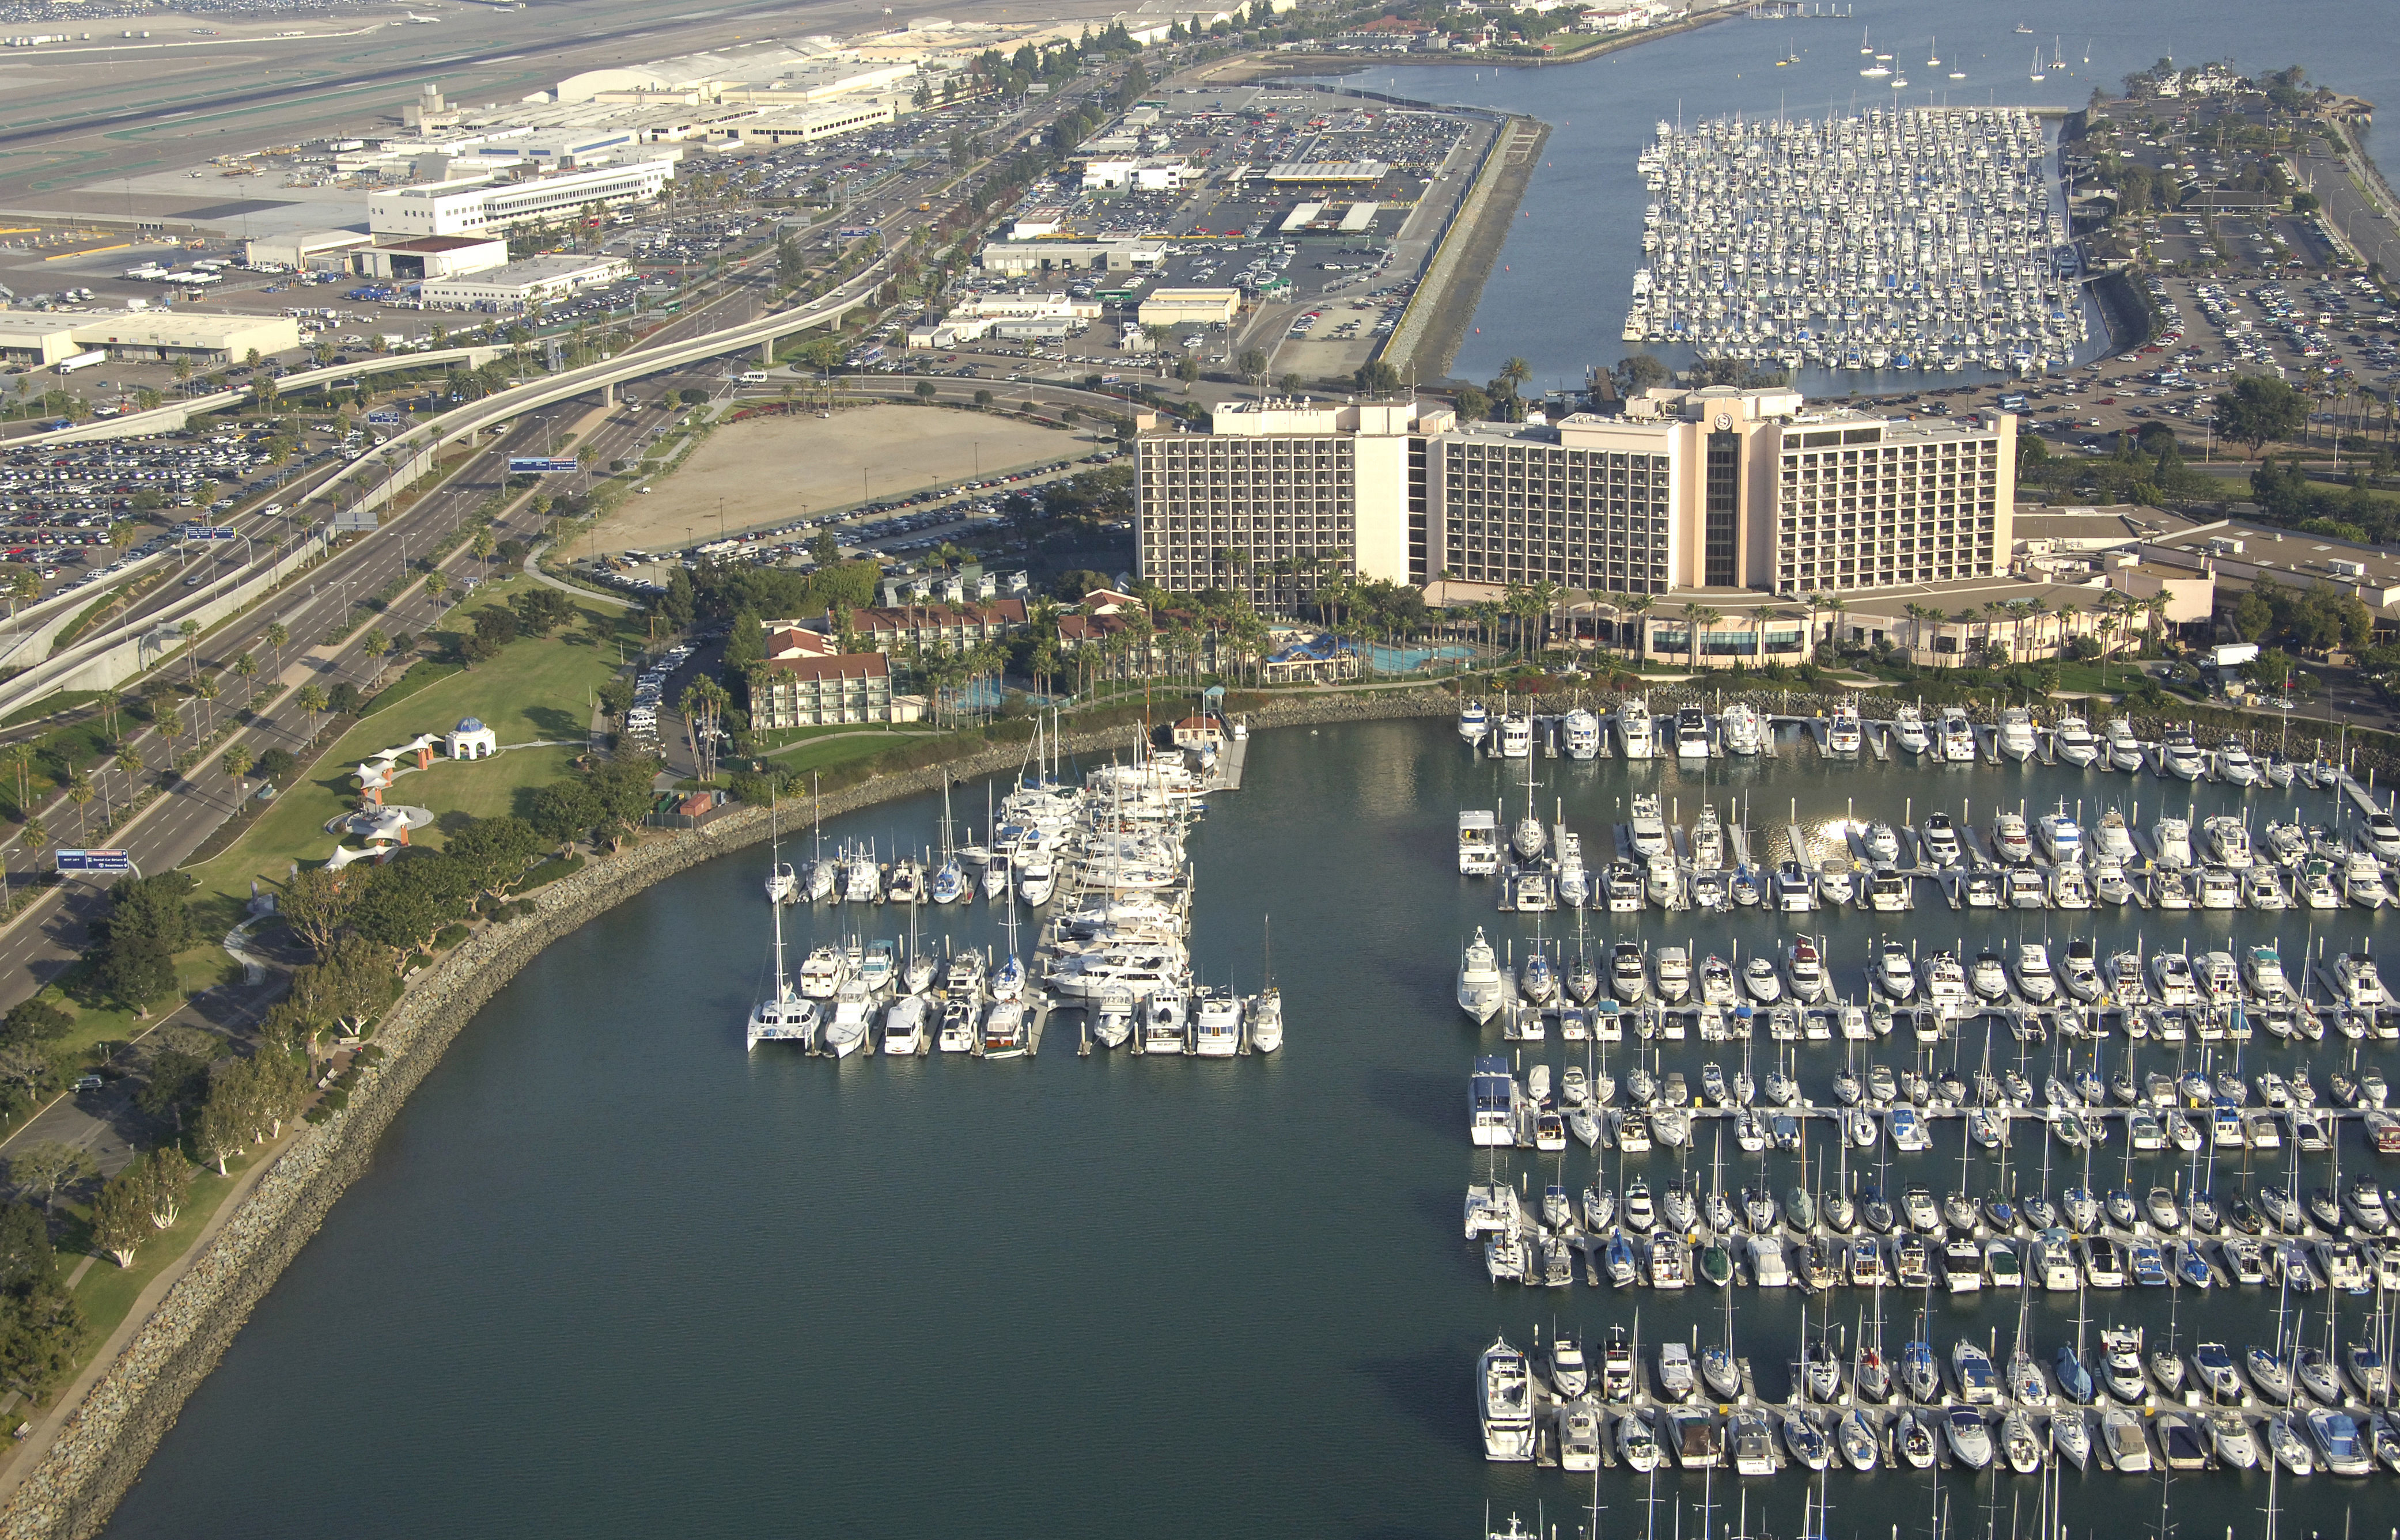 Sheraton Hotel San Diego Hotel And Marina